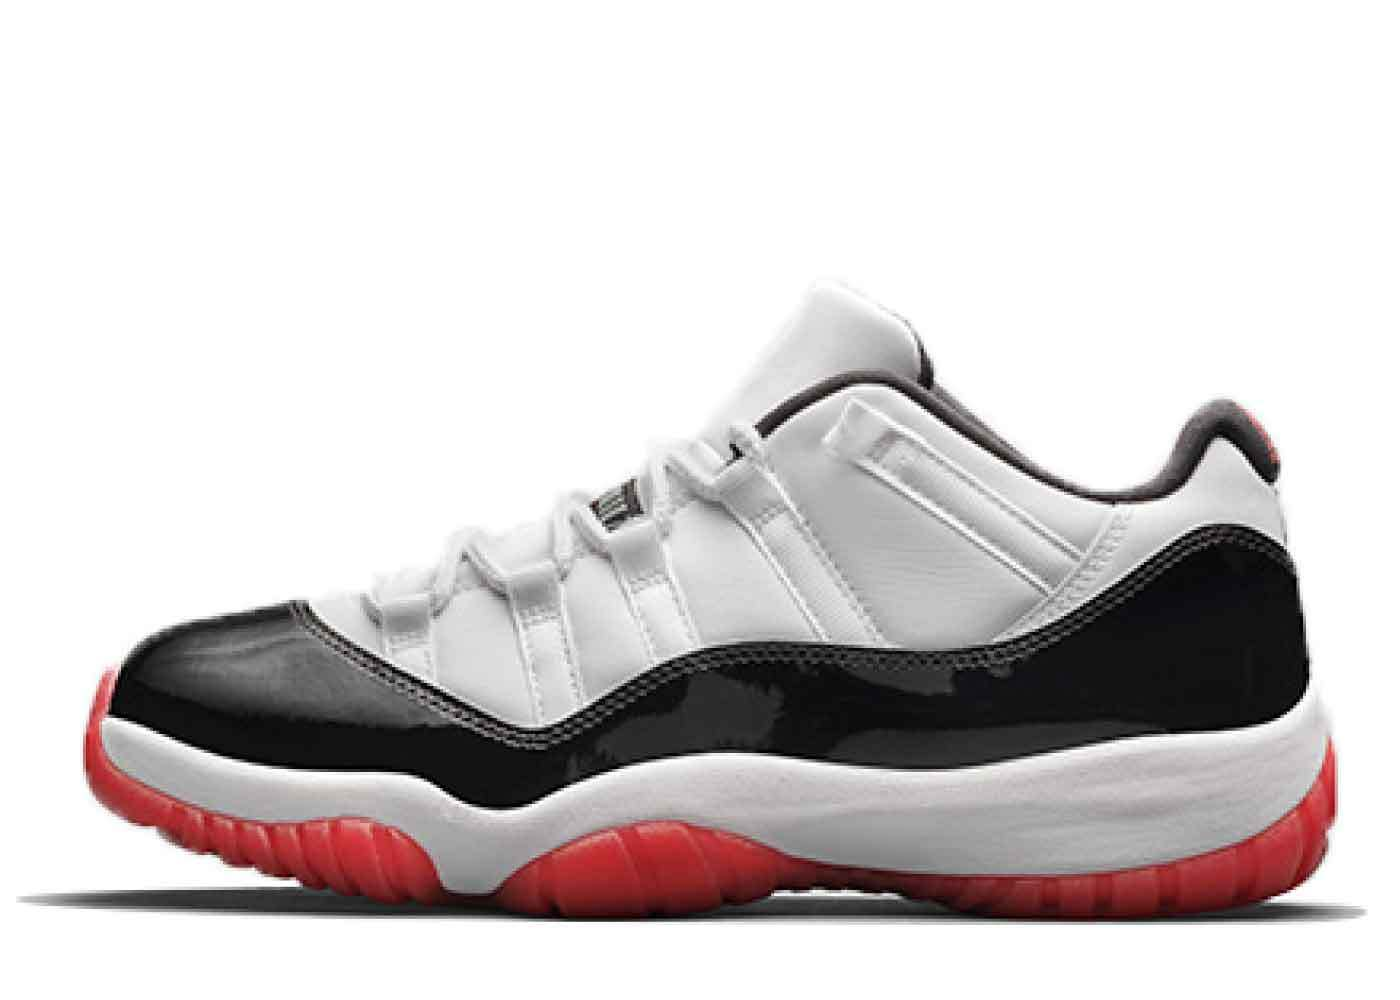 Nike Air Jordan 11 Low White Bredの写真